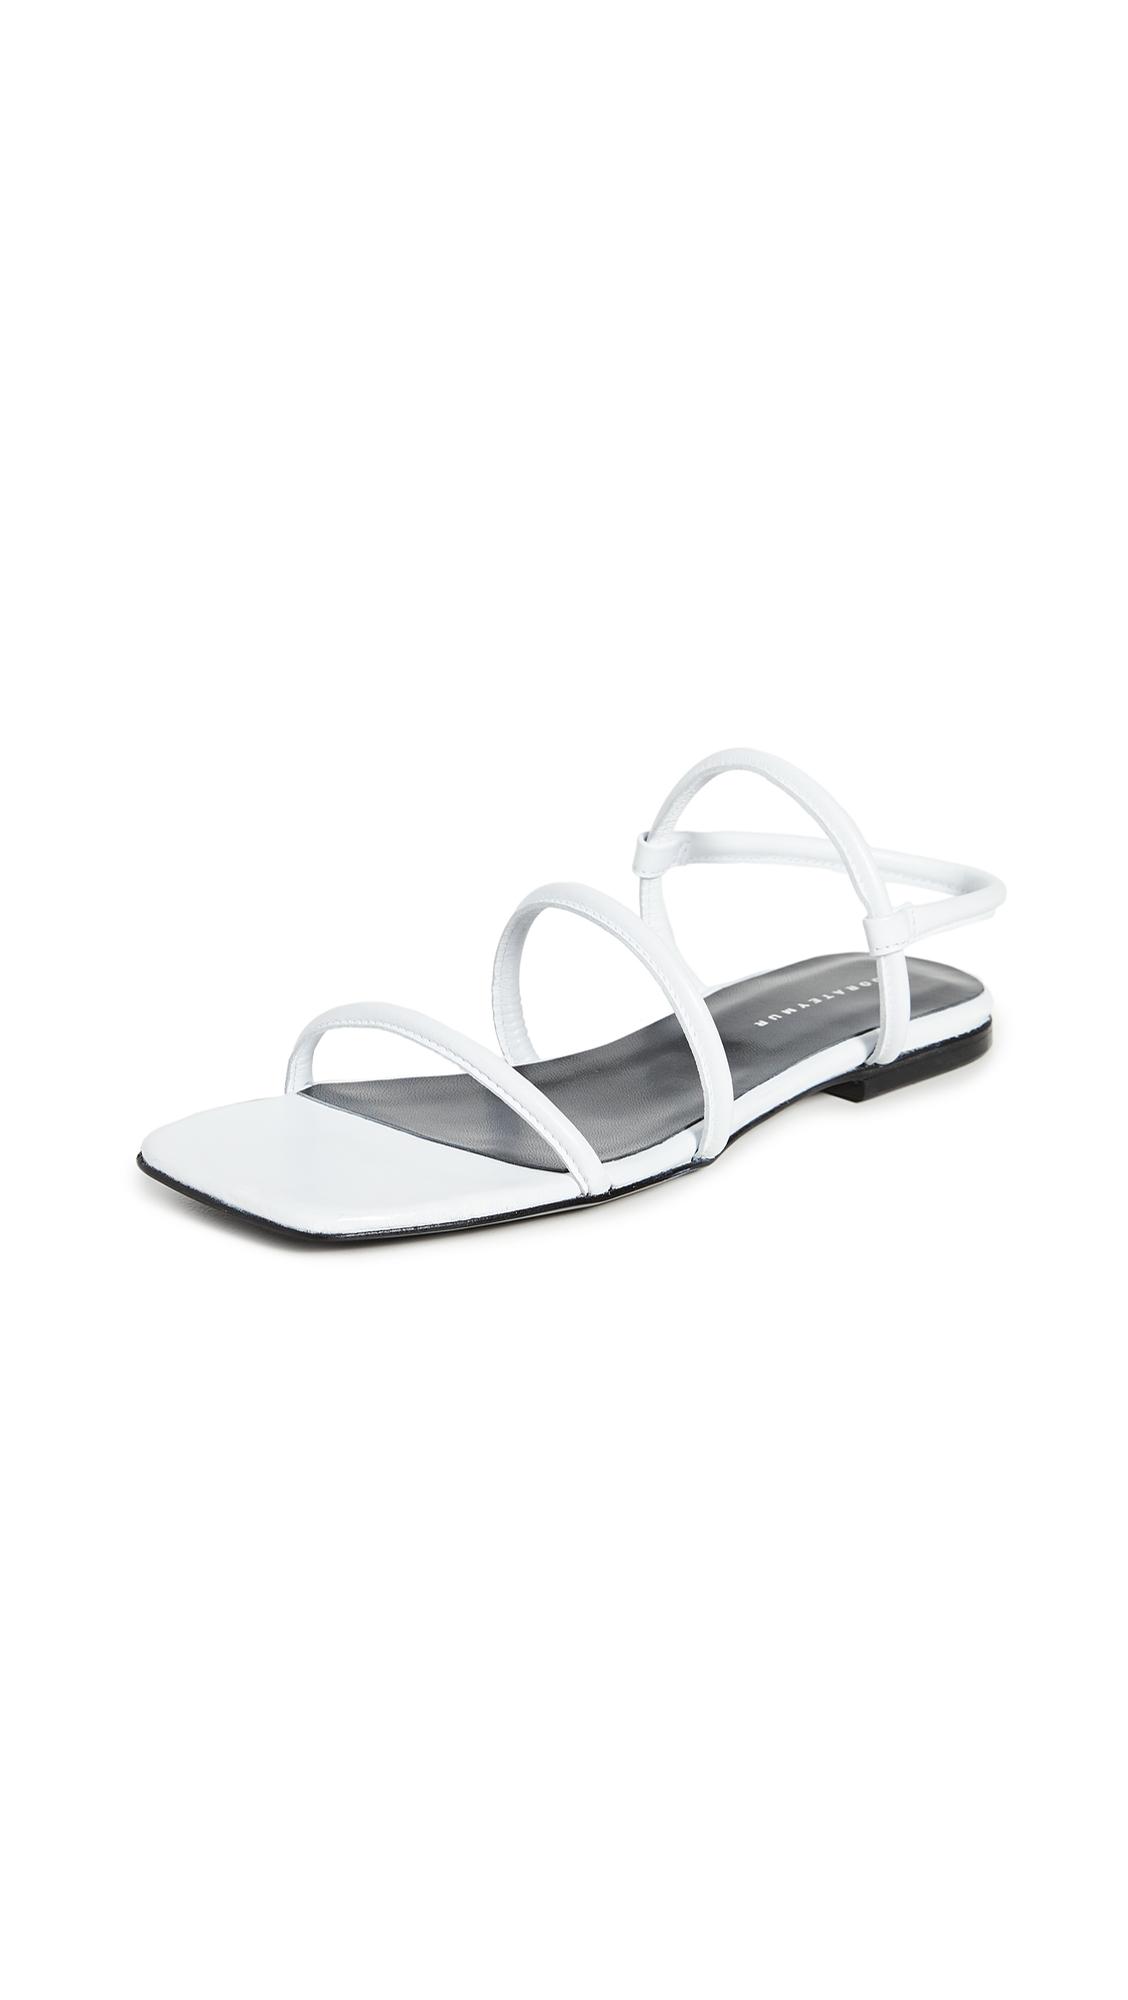 Dorateymur Easy Sandals - 50% Off Sale